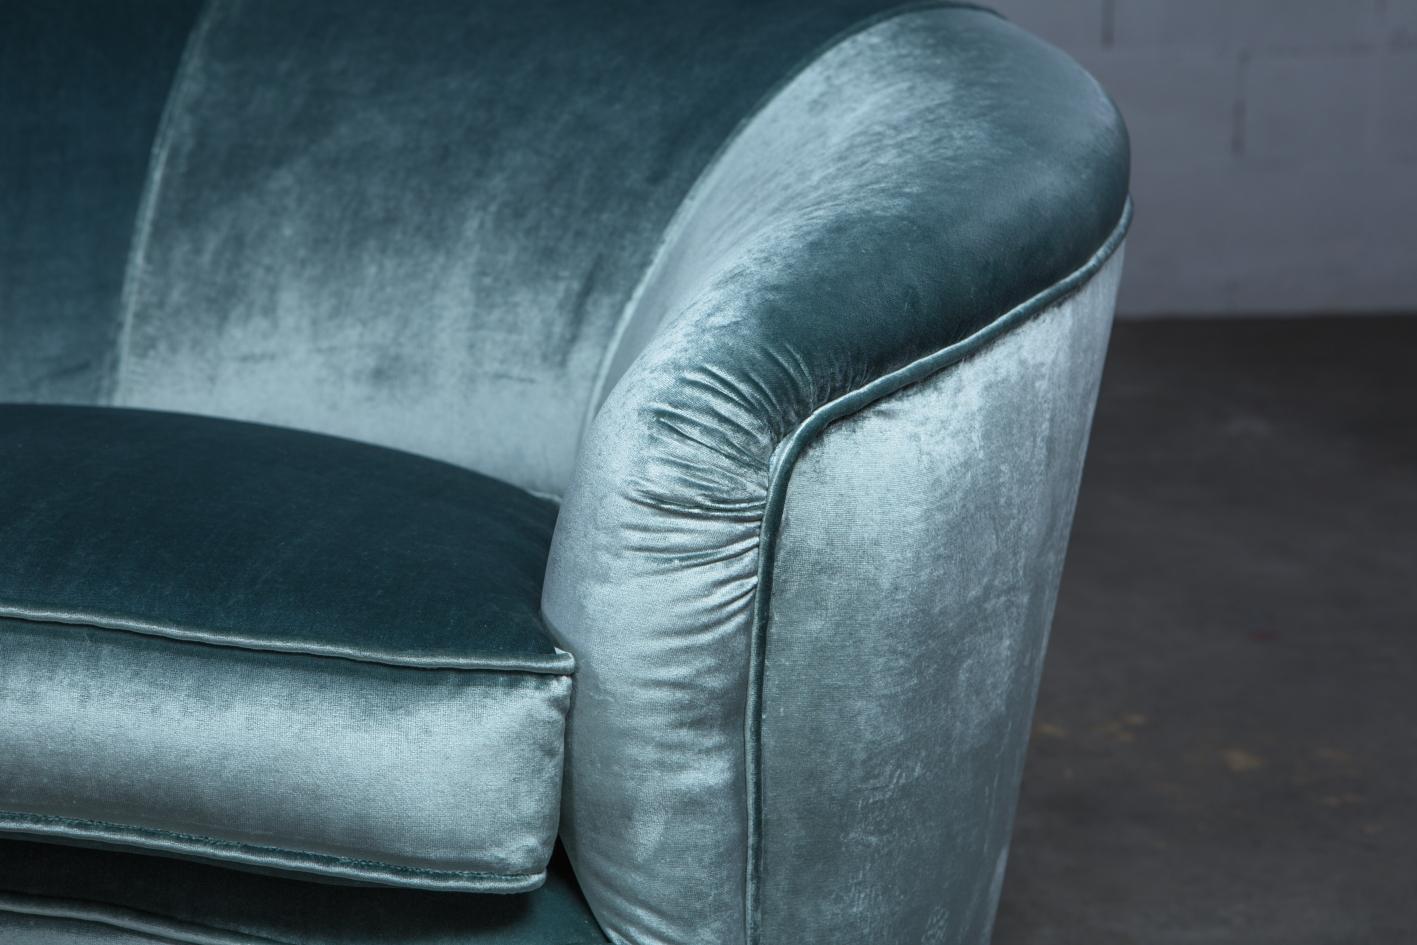 Three seater mid century Italian curved sofa - 1940s - light blue velvet